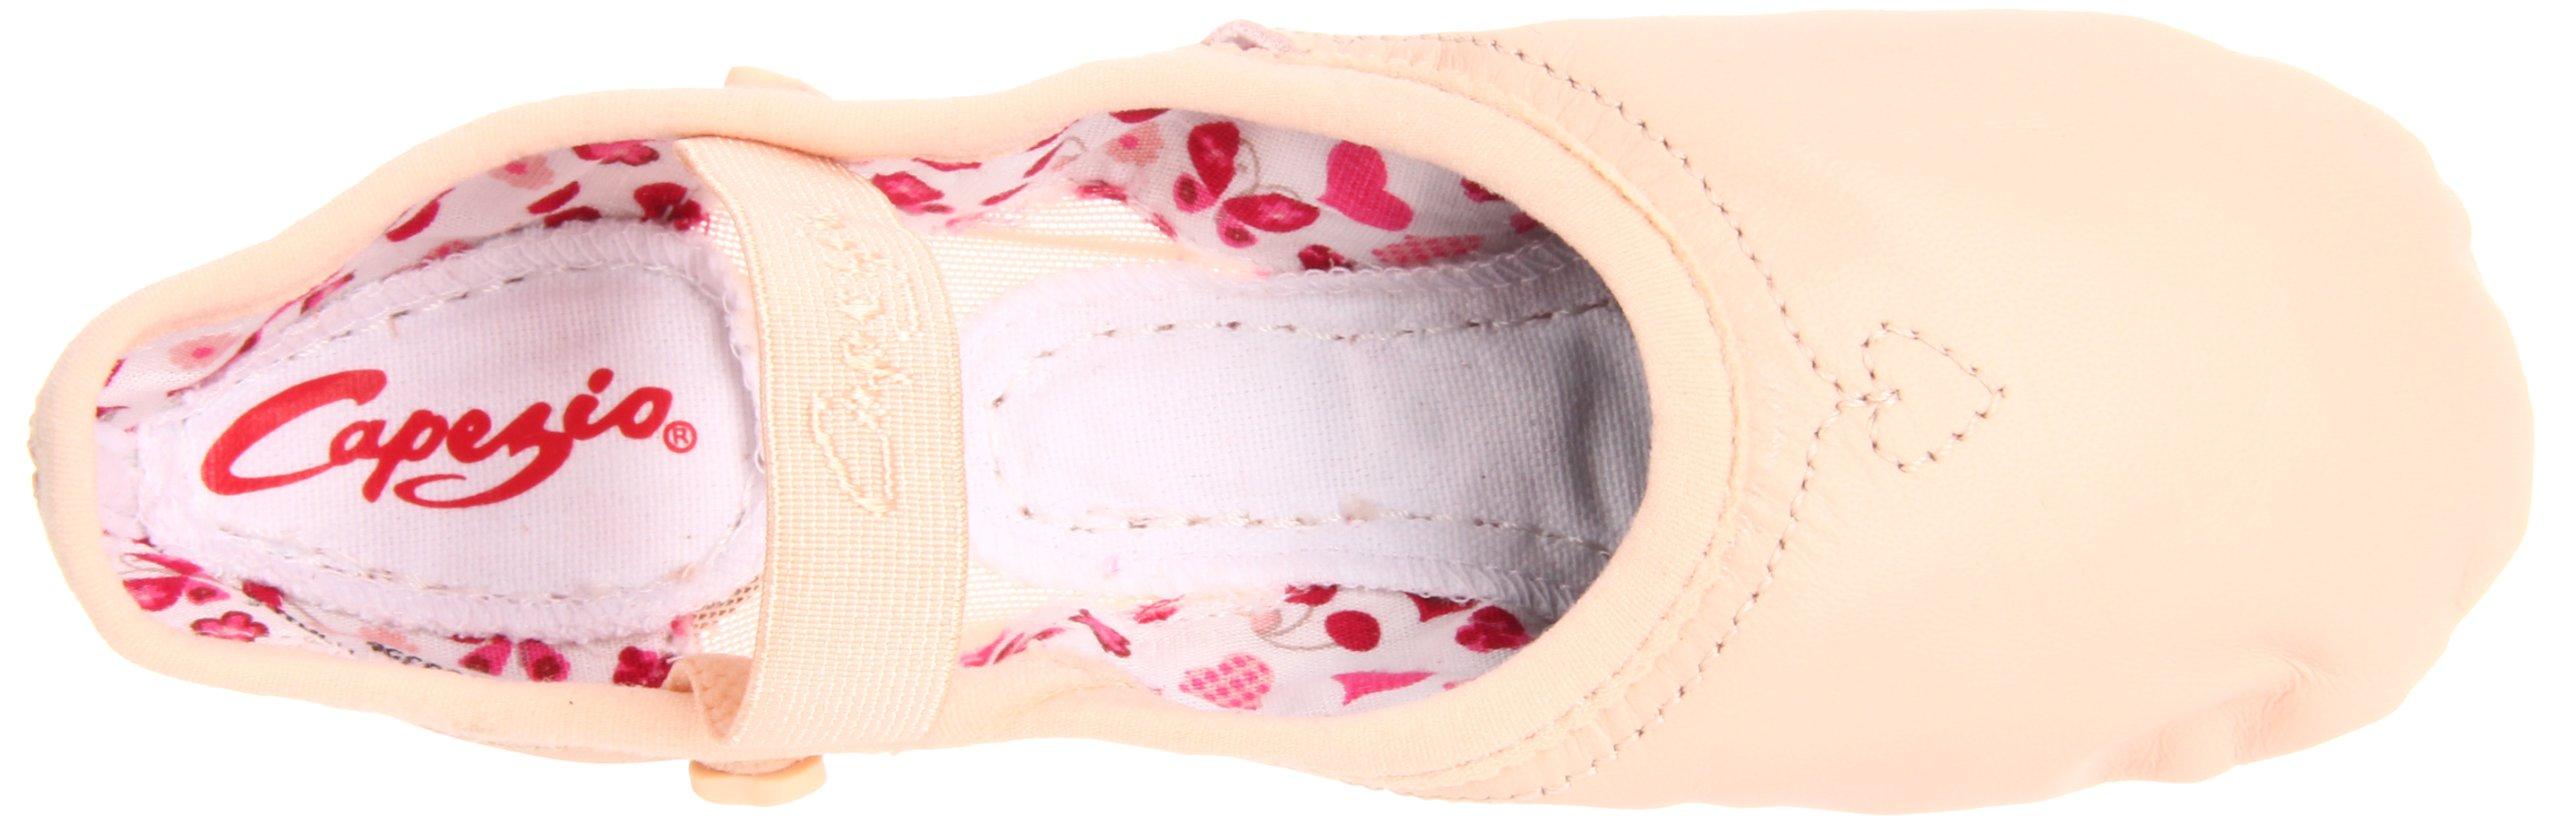 Capezio Love Ballet Flat (Toddler/Little Kid),Pink,11 M US Little Kid by Capezio (Image #7)